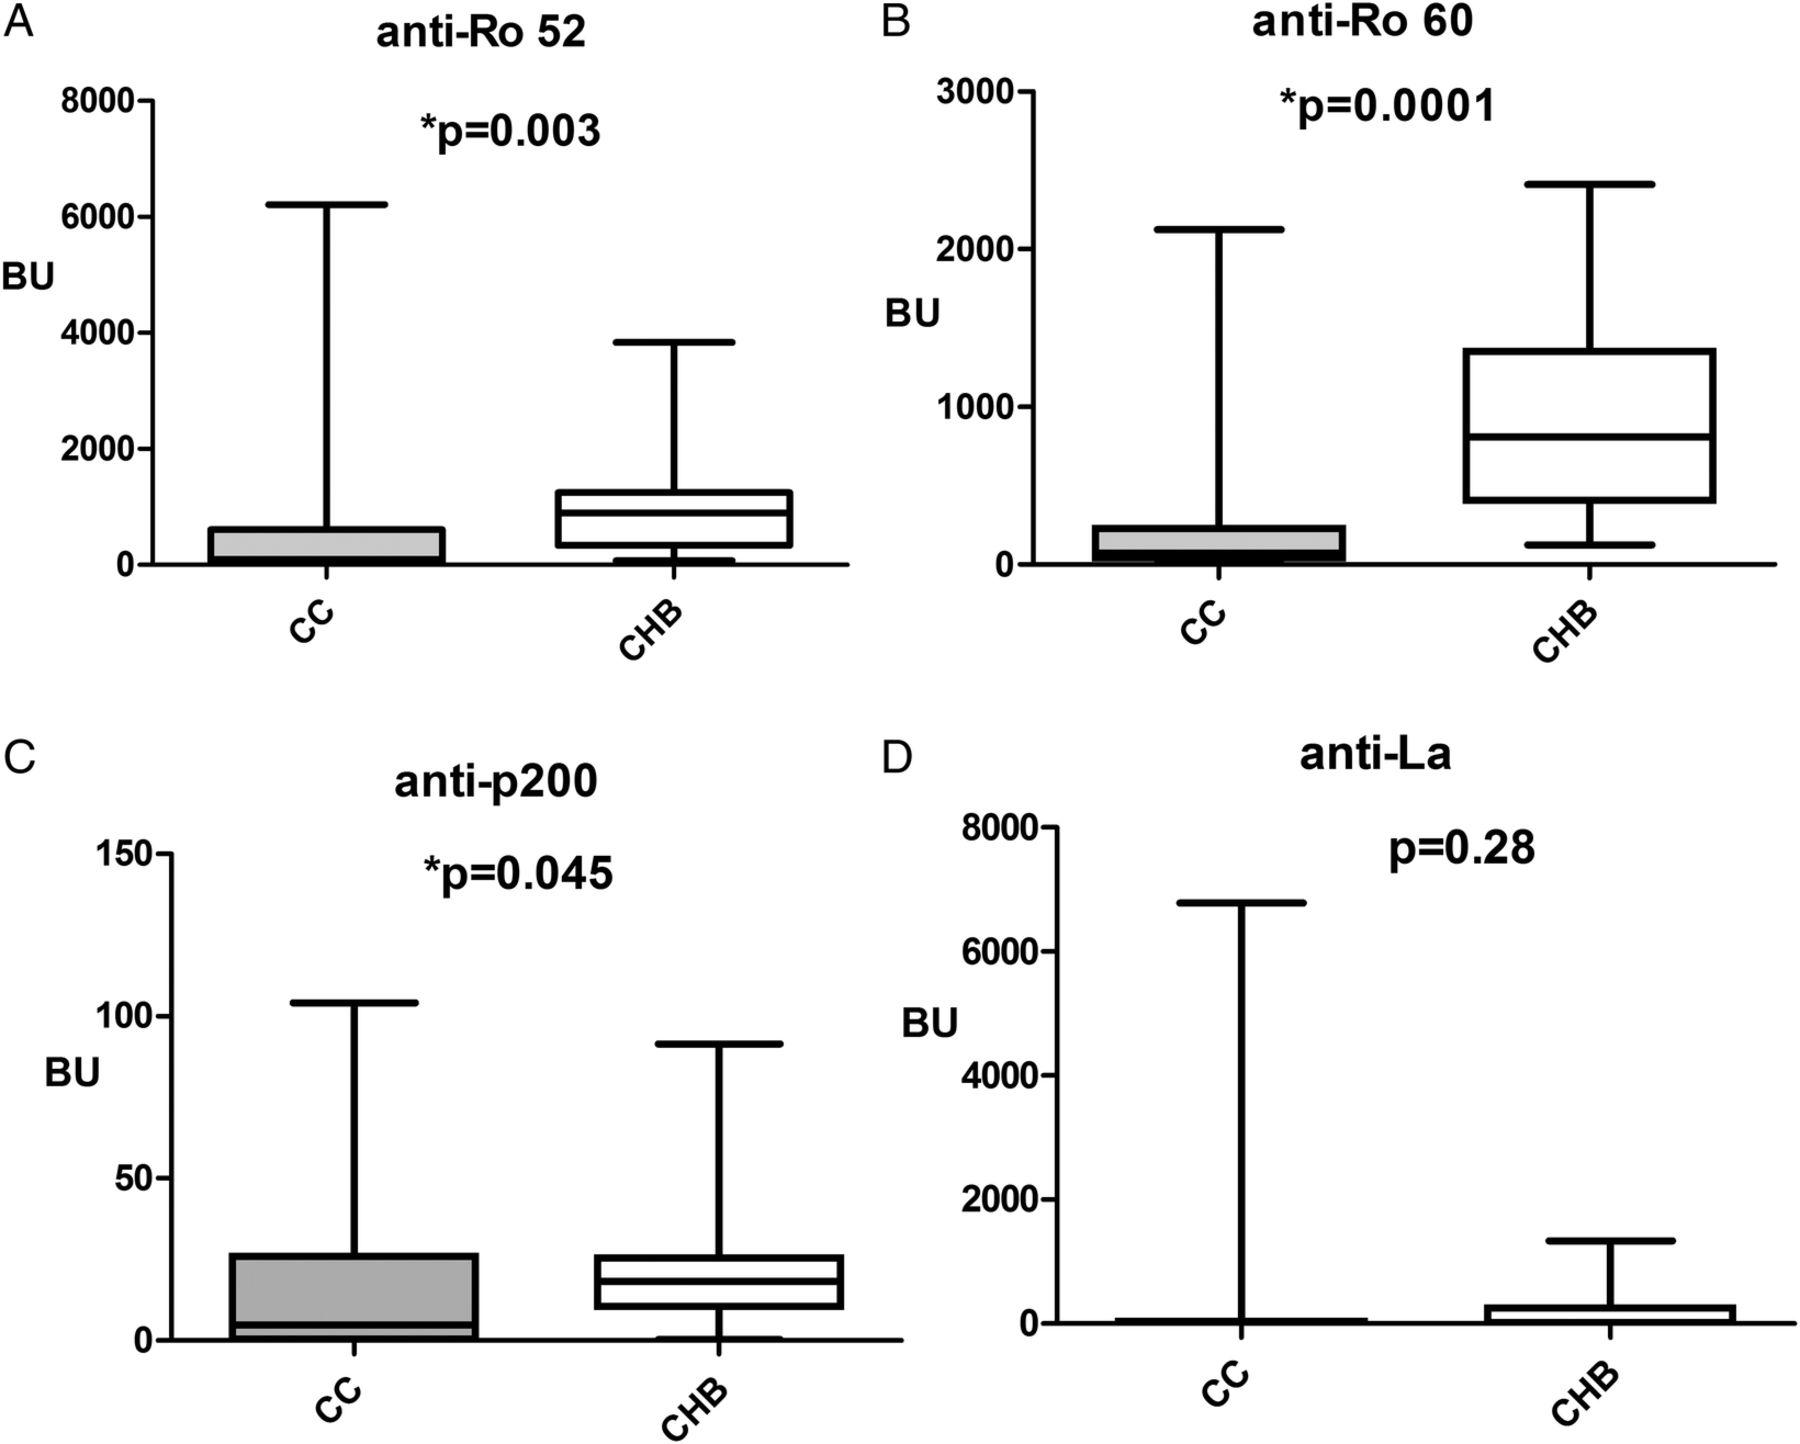 Maternal autoantibody profiles at risk for autoimmune